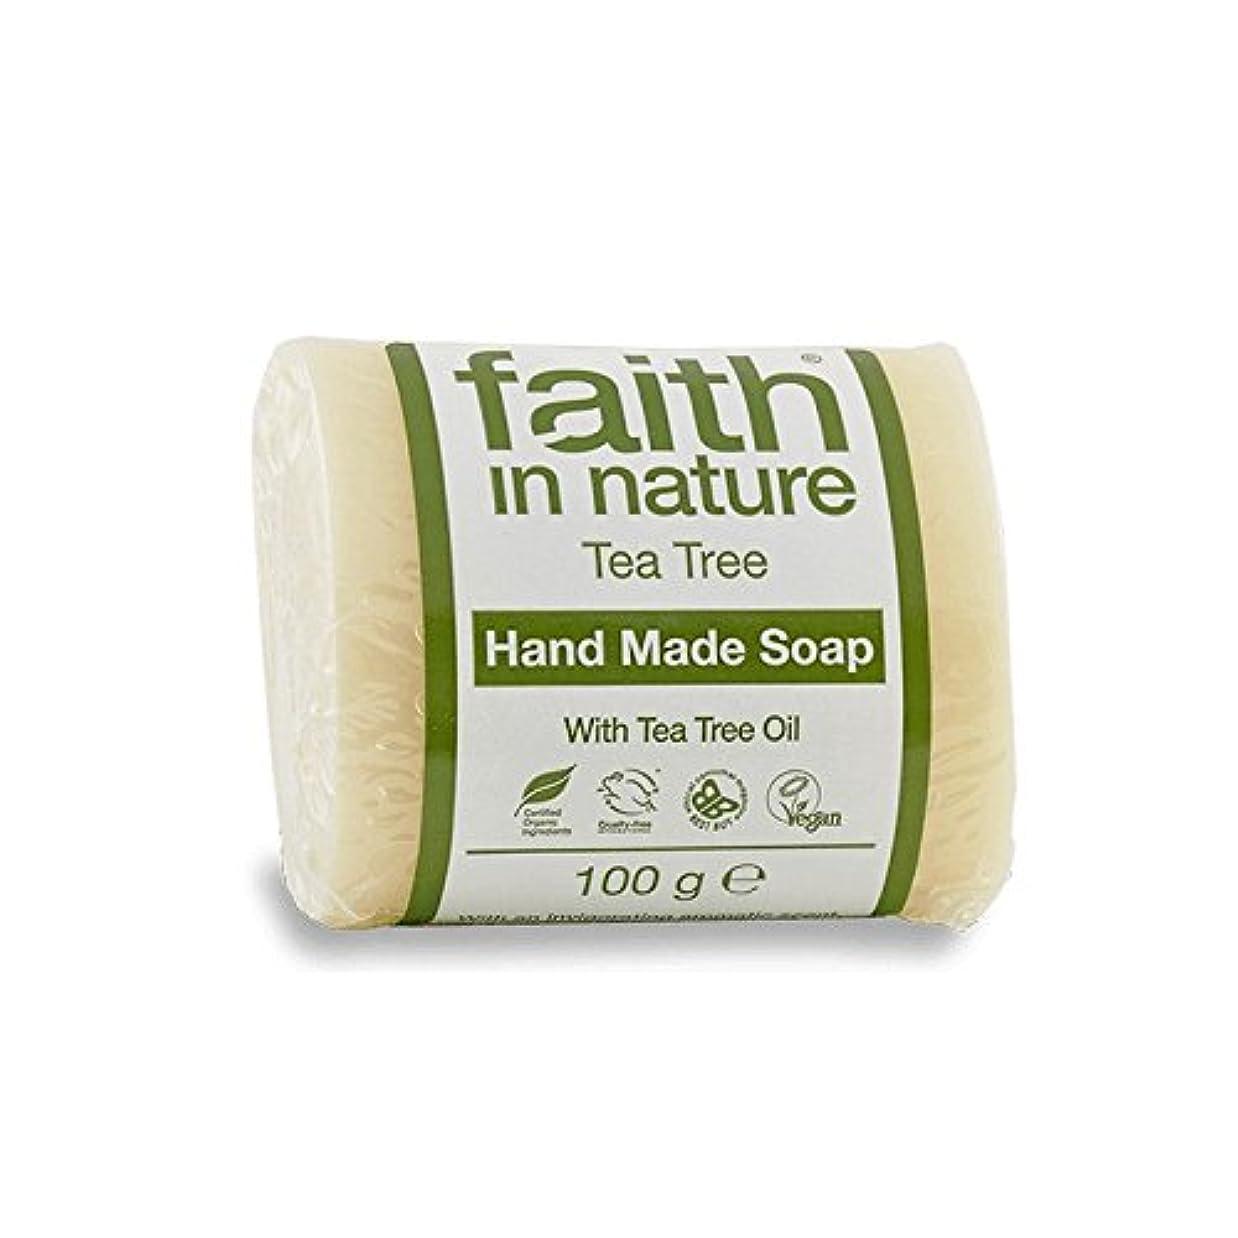 Faith in Nature Tea Tree Soap 100g (Pack of 6) - 自然のティーツリーソープ100グラムの信仰 (x6) [並行輸入品]